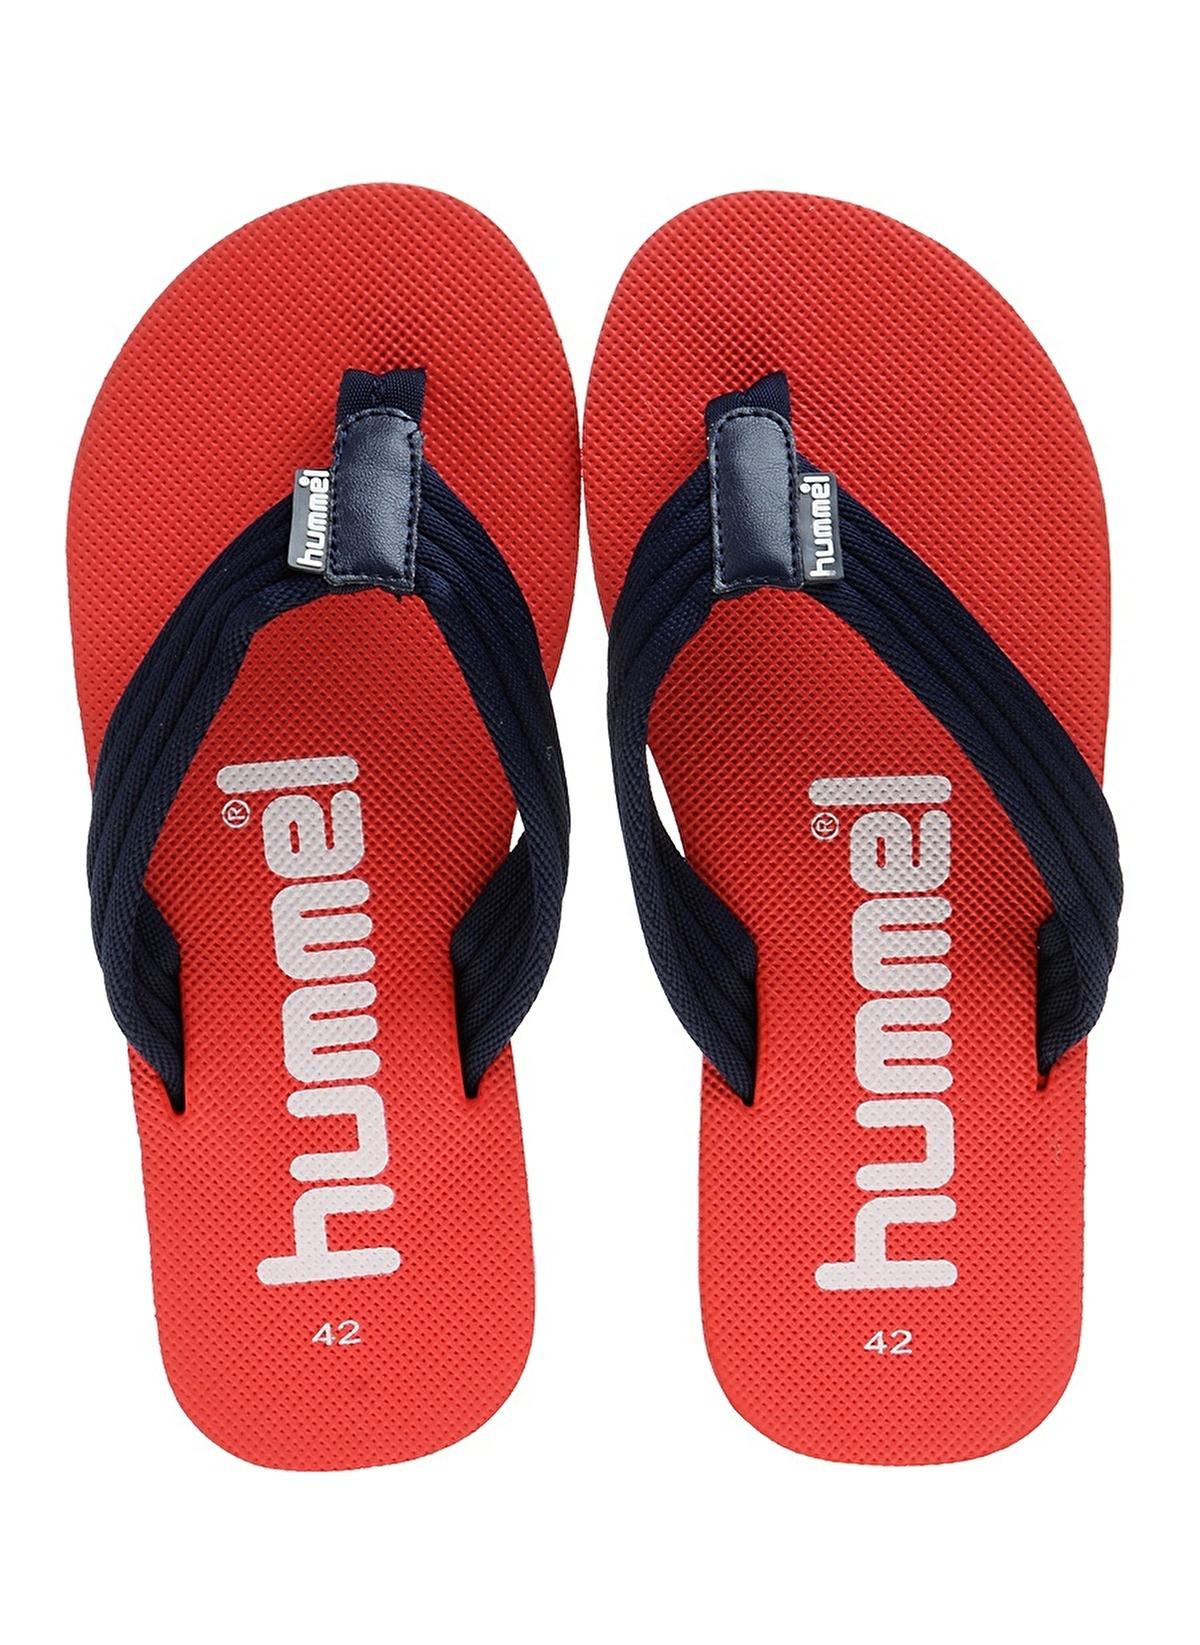 Hummel Plaj Terliği 60505-3001 Flip Flop Ts – 39.95 TL